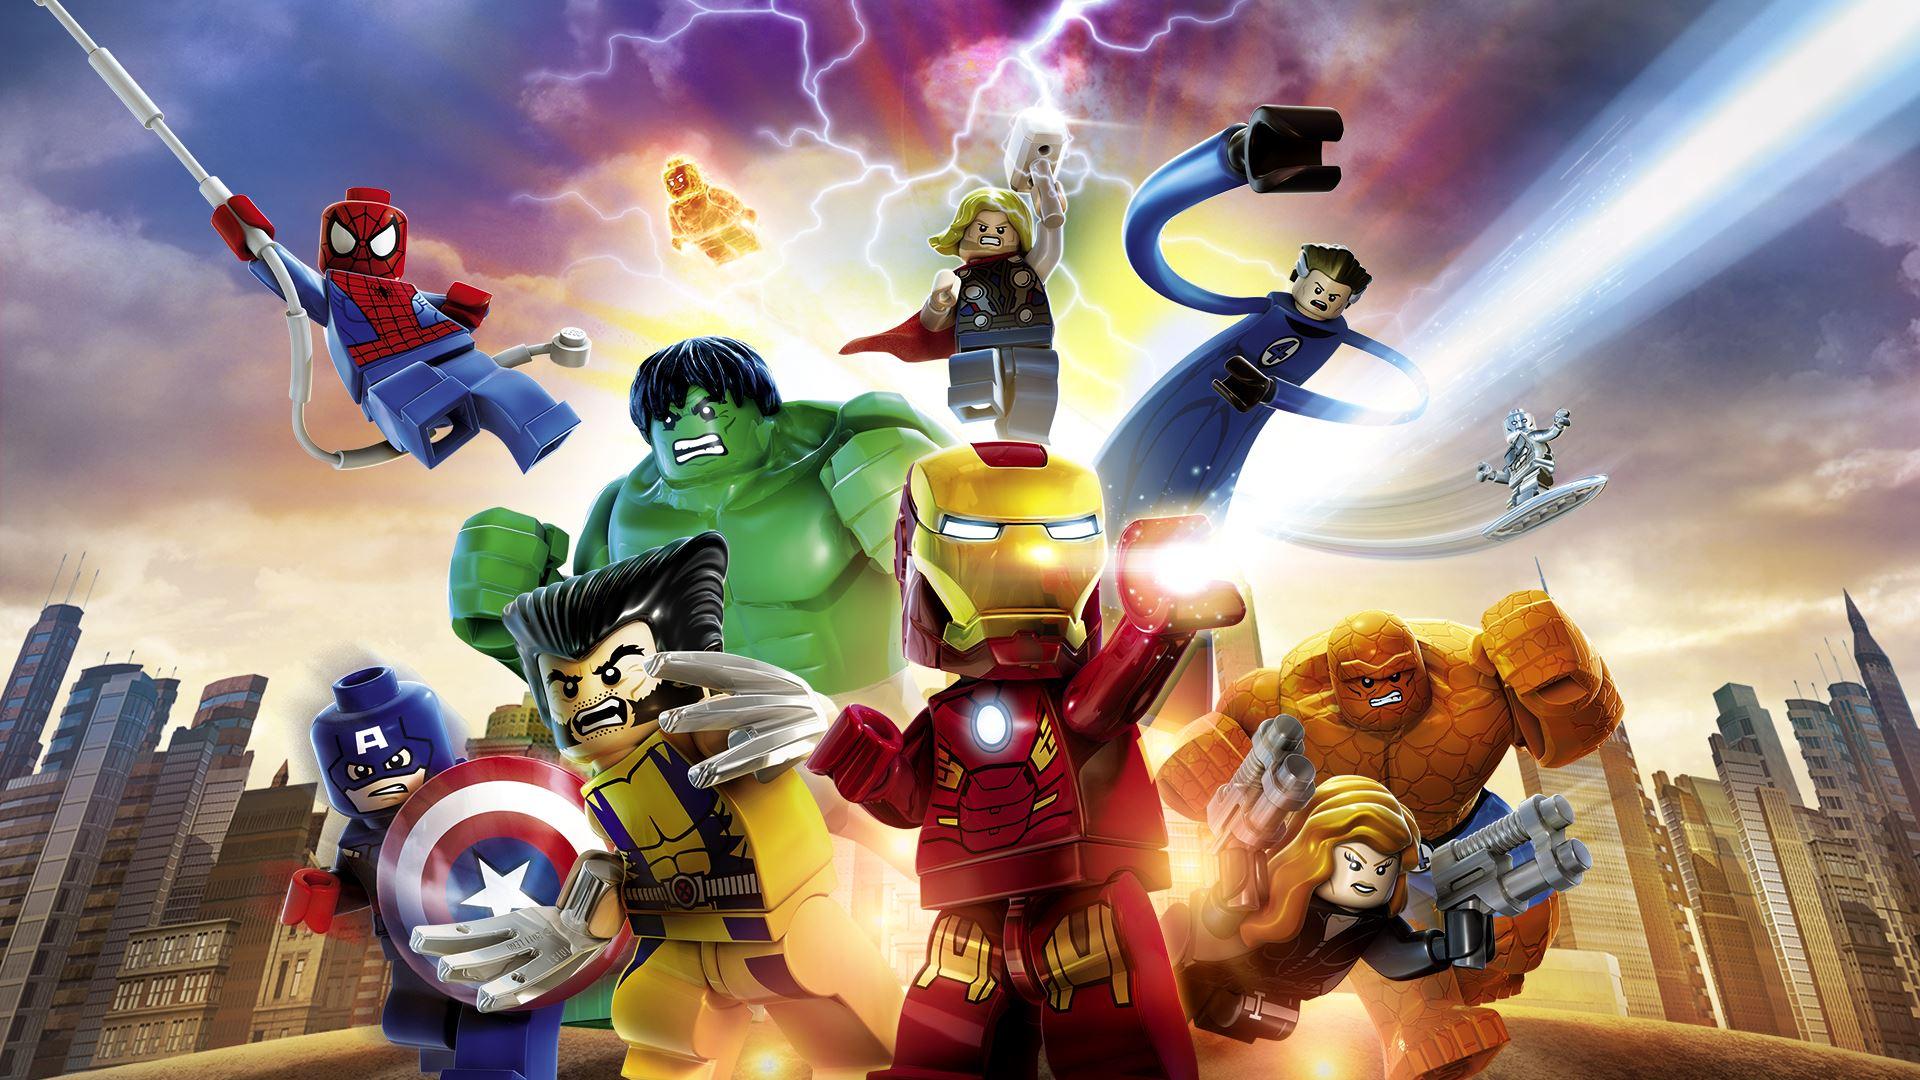 Coolest Marvel Superheroes LEGO Sets Geeks 1920x1080